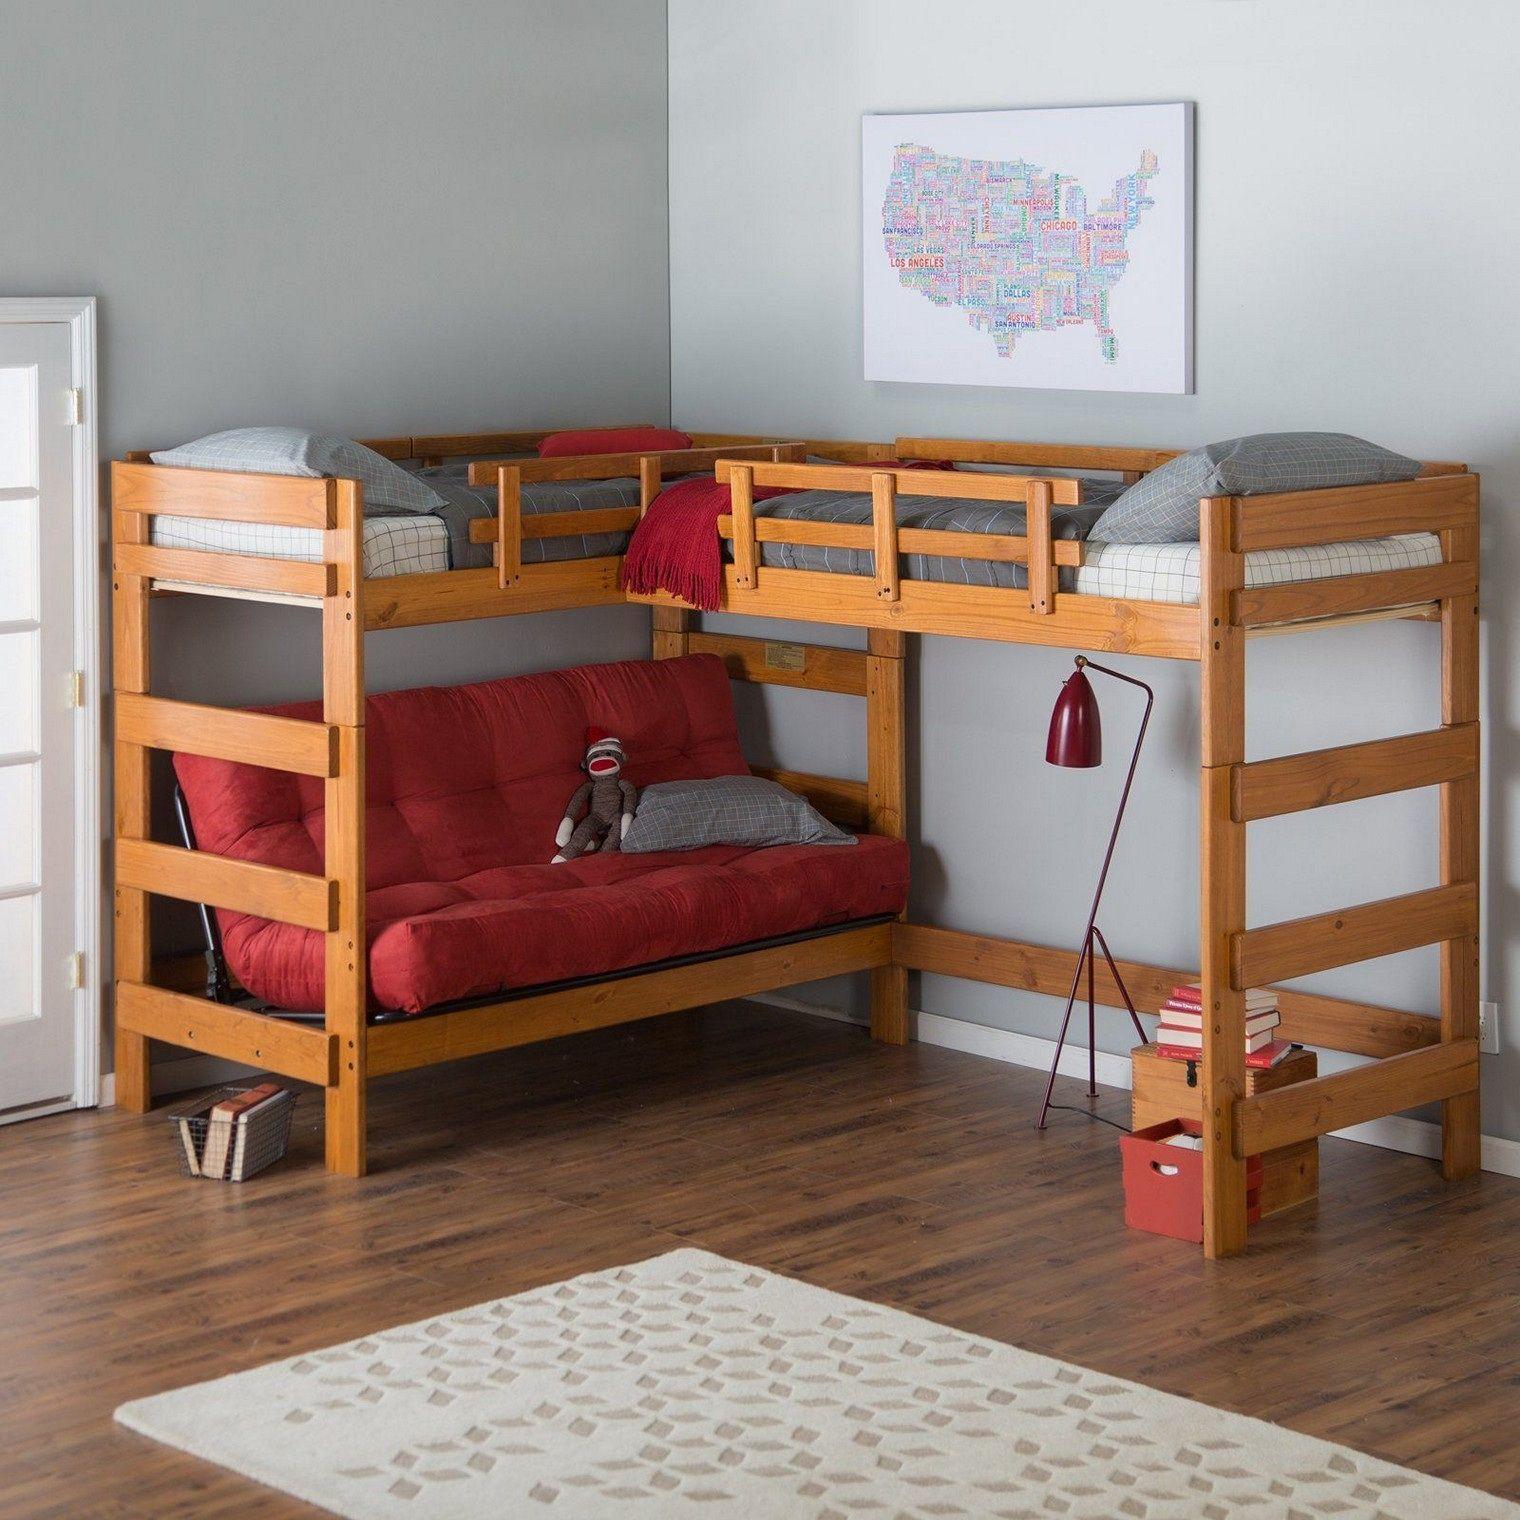 Triple builtin bunk beds. Each has its own book shelf